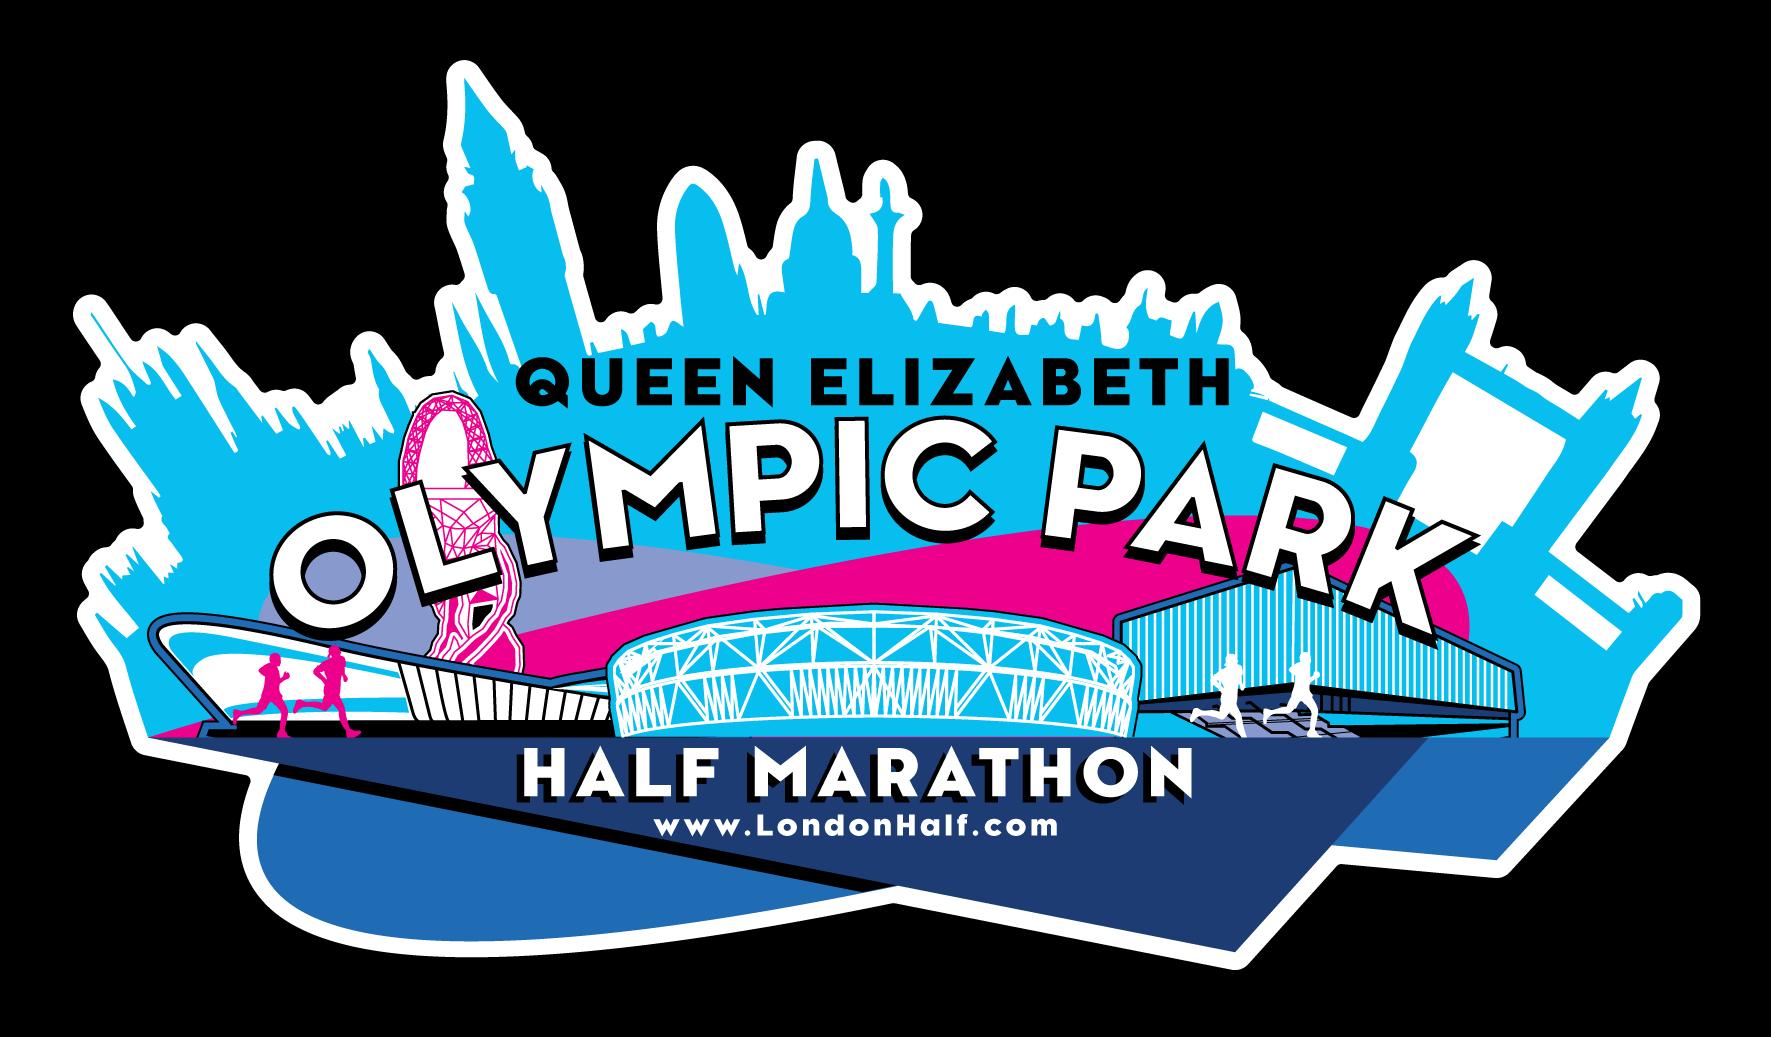 Queen Elizabeth Olympic Park Half Marathon | London Half